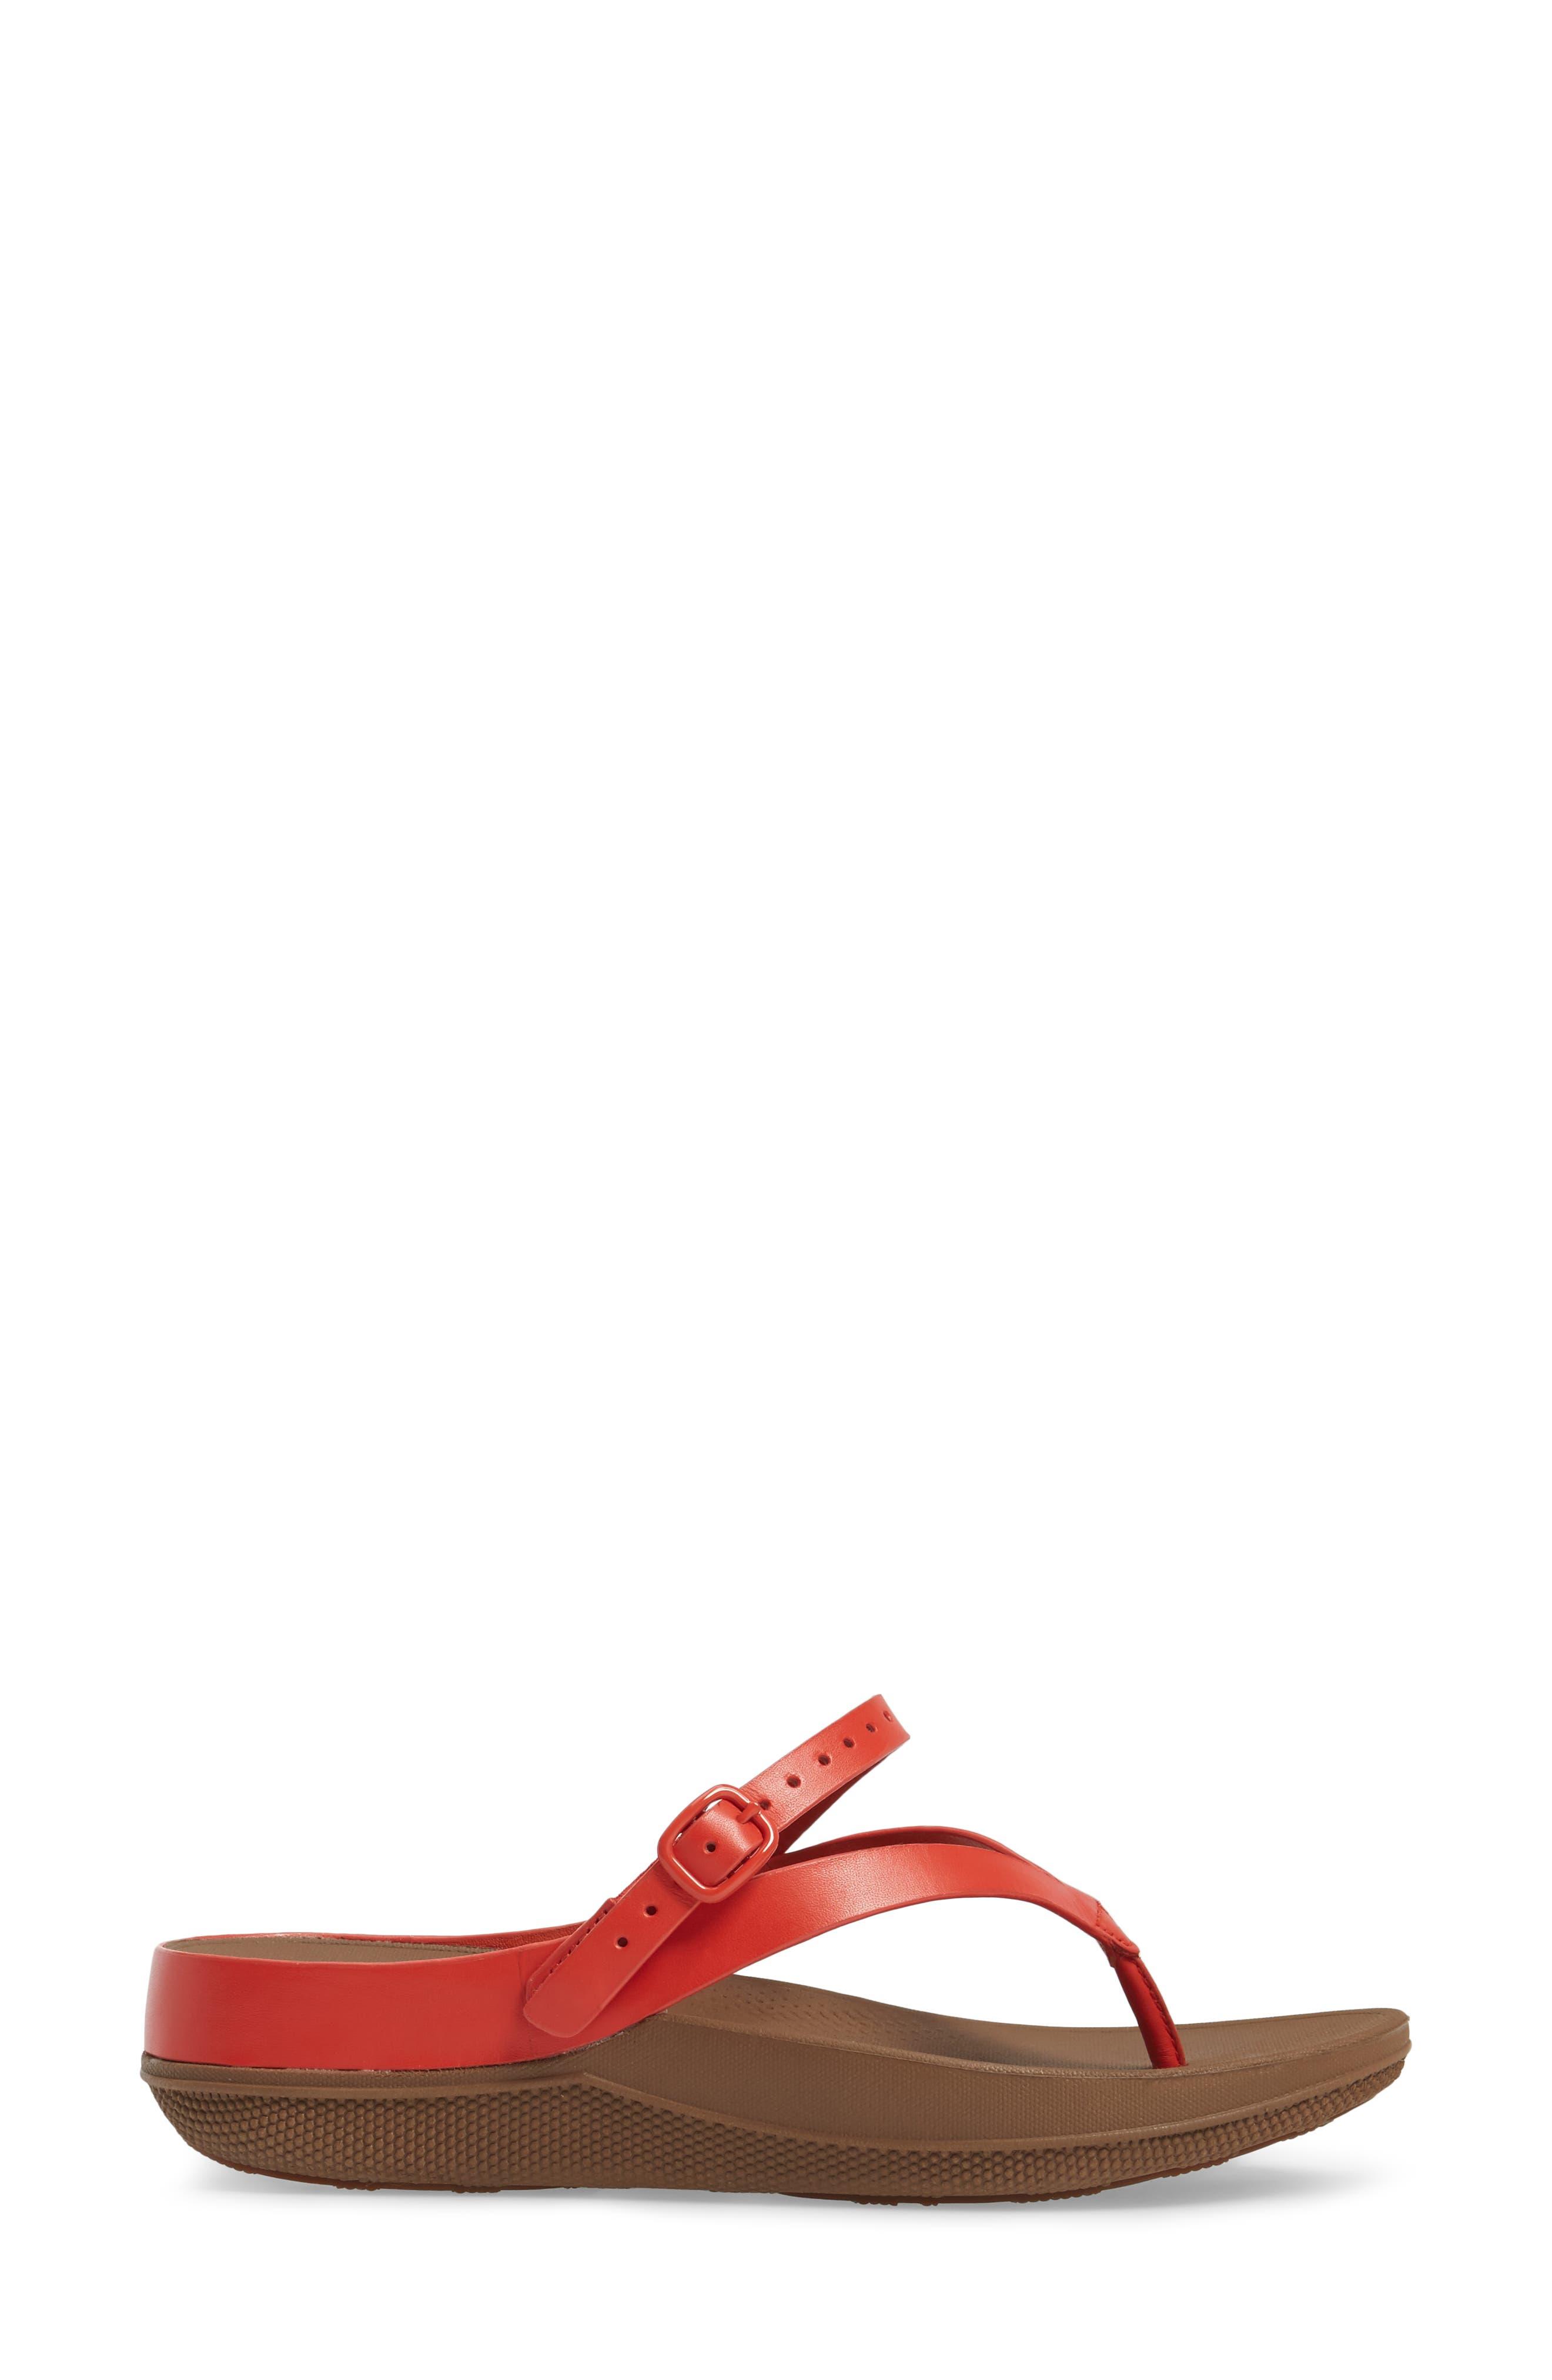 Alternate Image 3  - FitFlop Flip Sandal (Women)